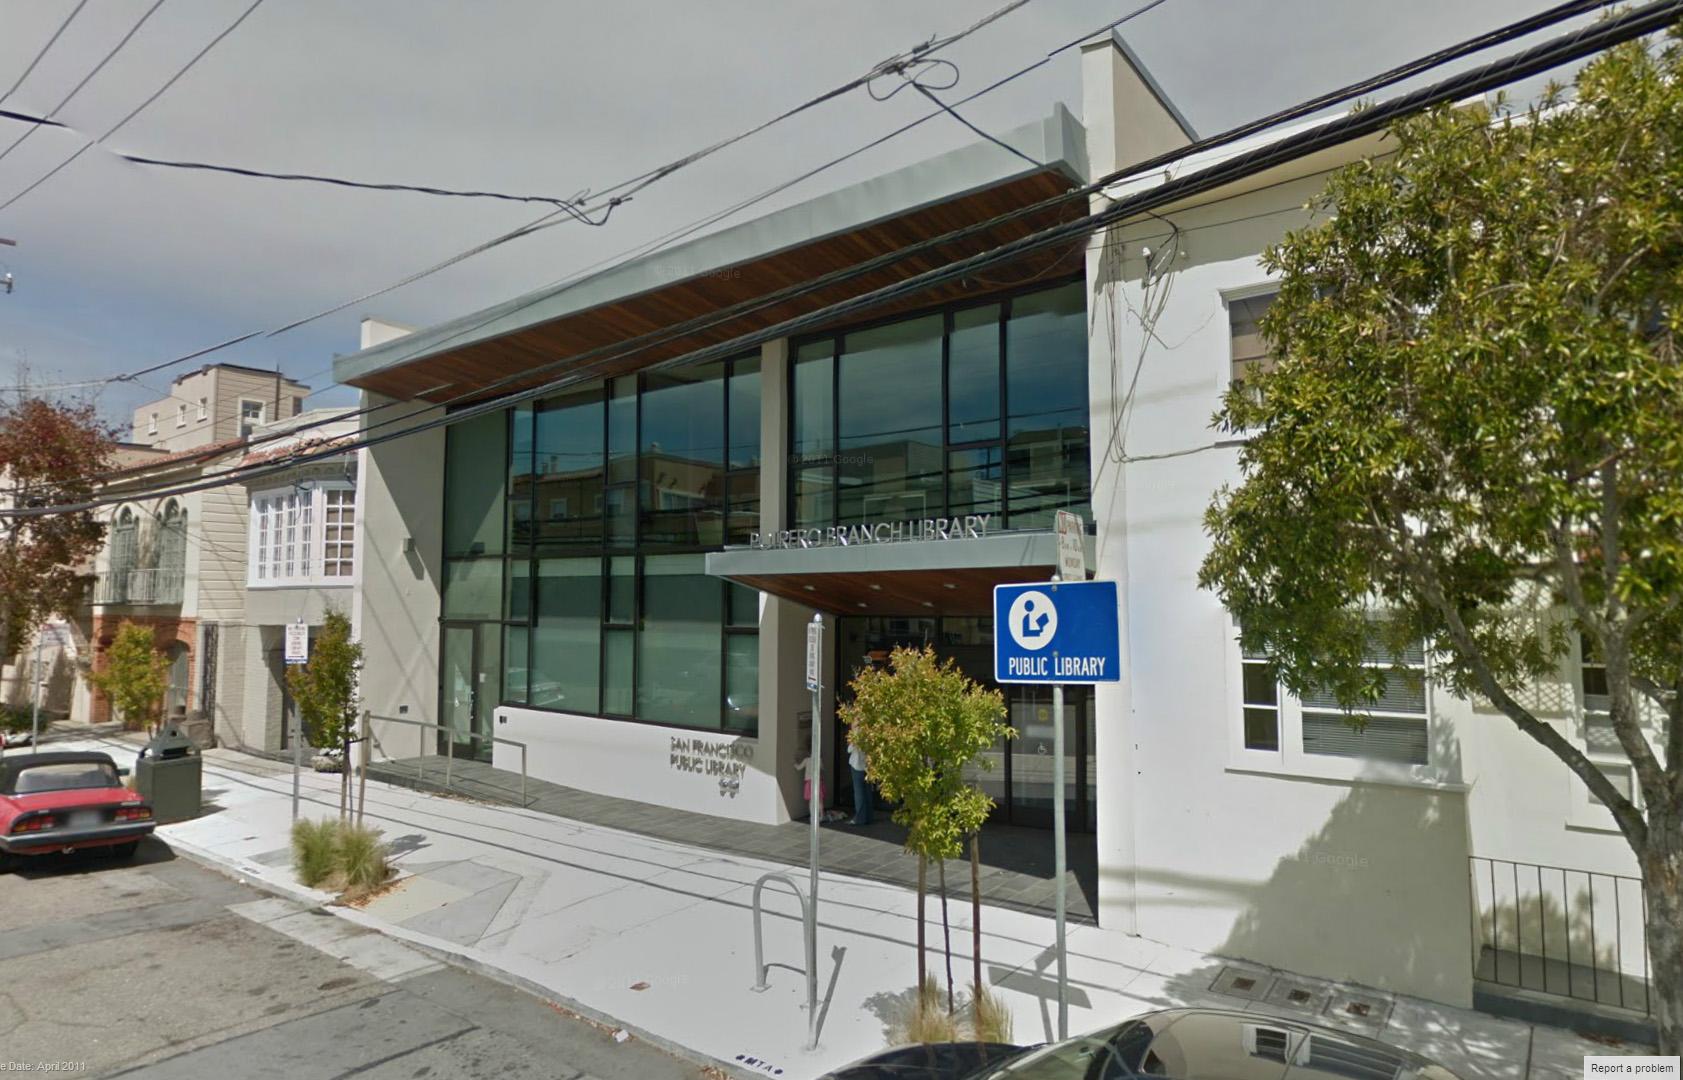 Potrero Hill Library Street View.jpg